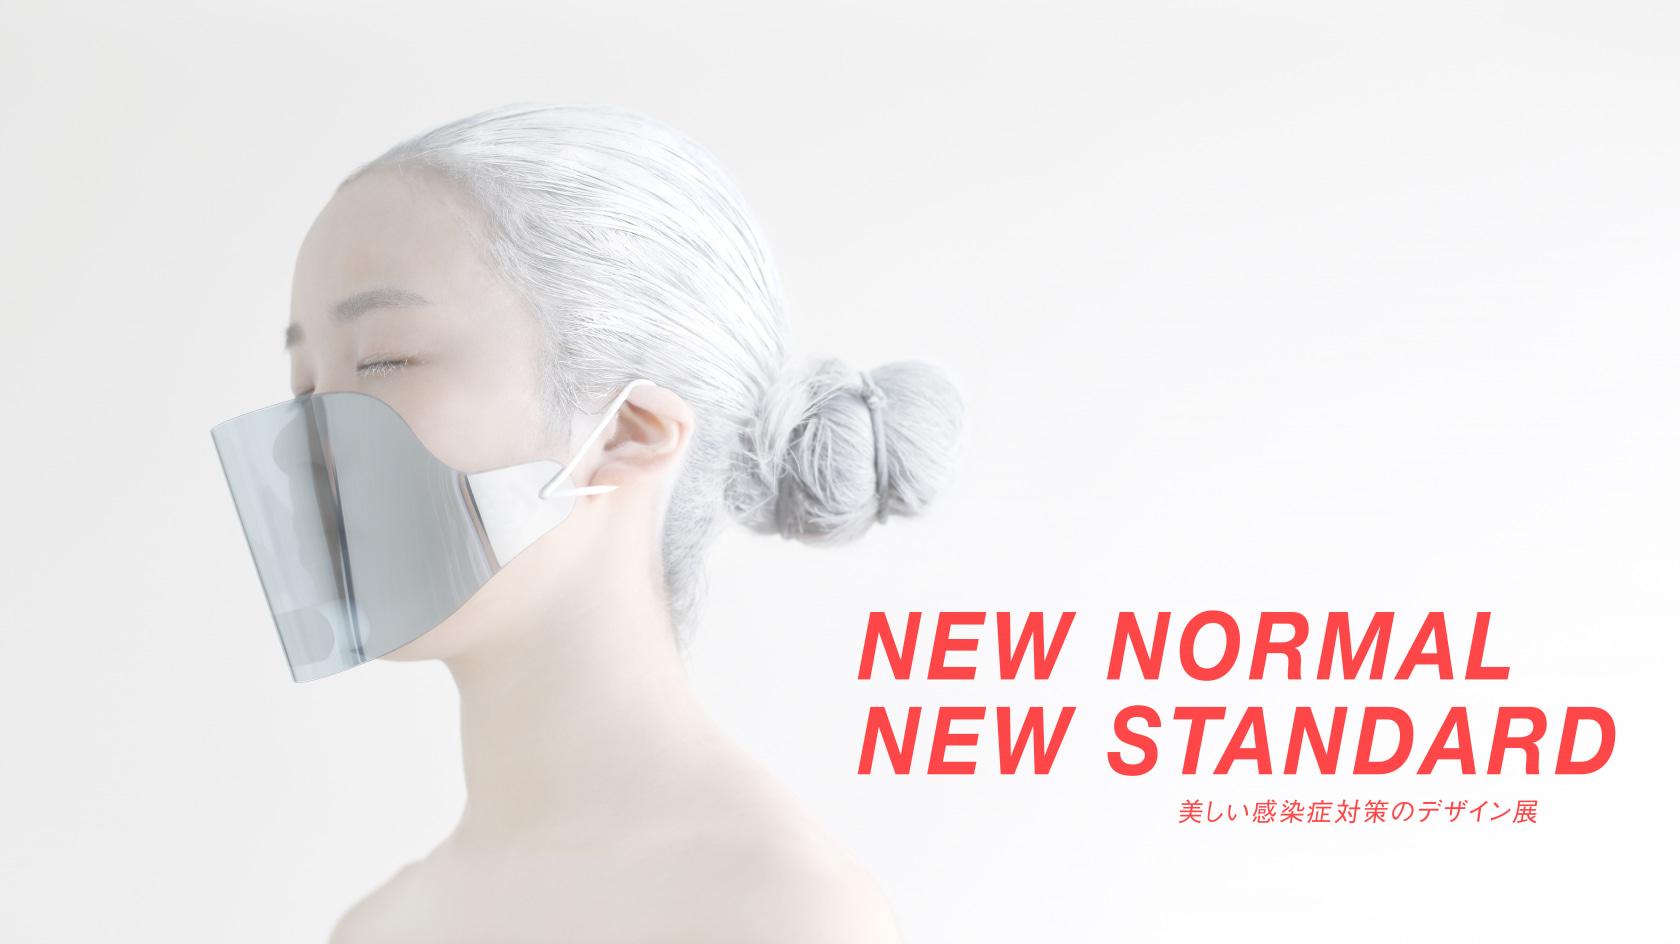 NEW NORMAL, NEW STANDARD-美しい感染症対策のデザイン展-